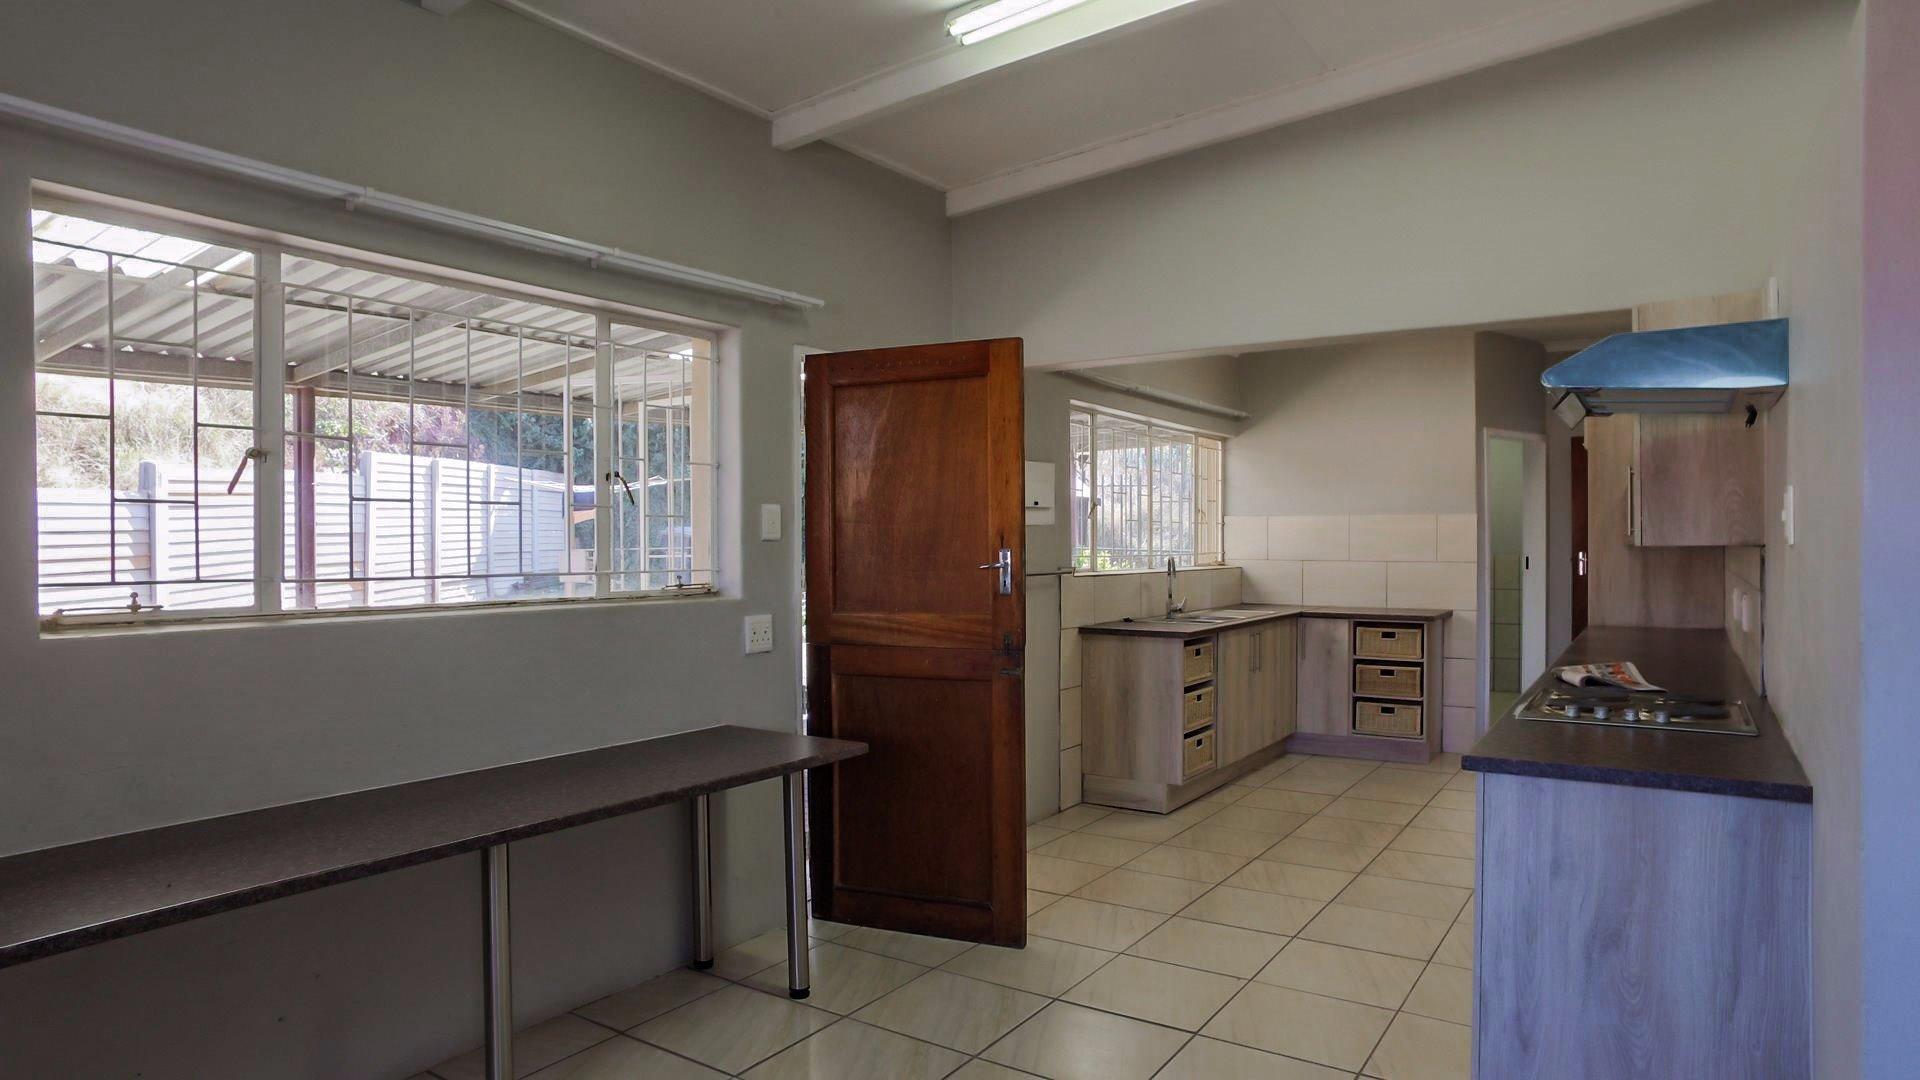 Erasmia property for sale. Ref No: 13379466. Picture no 12